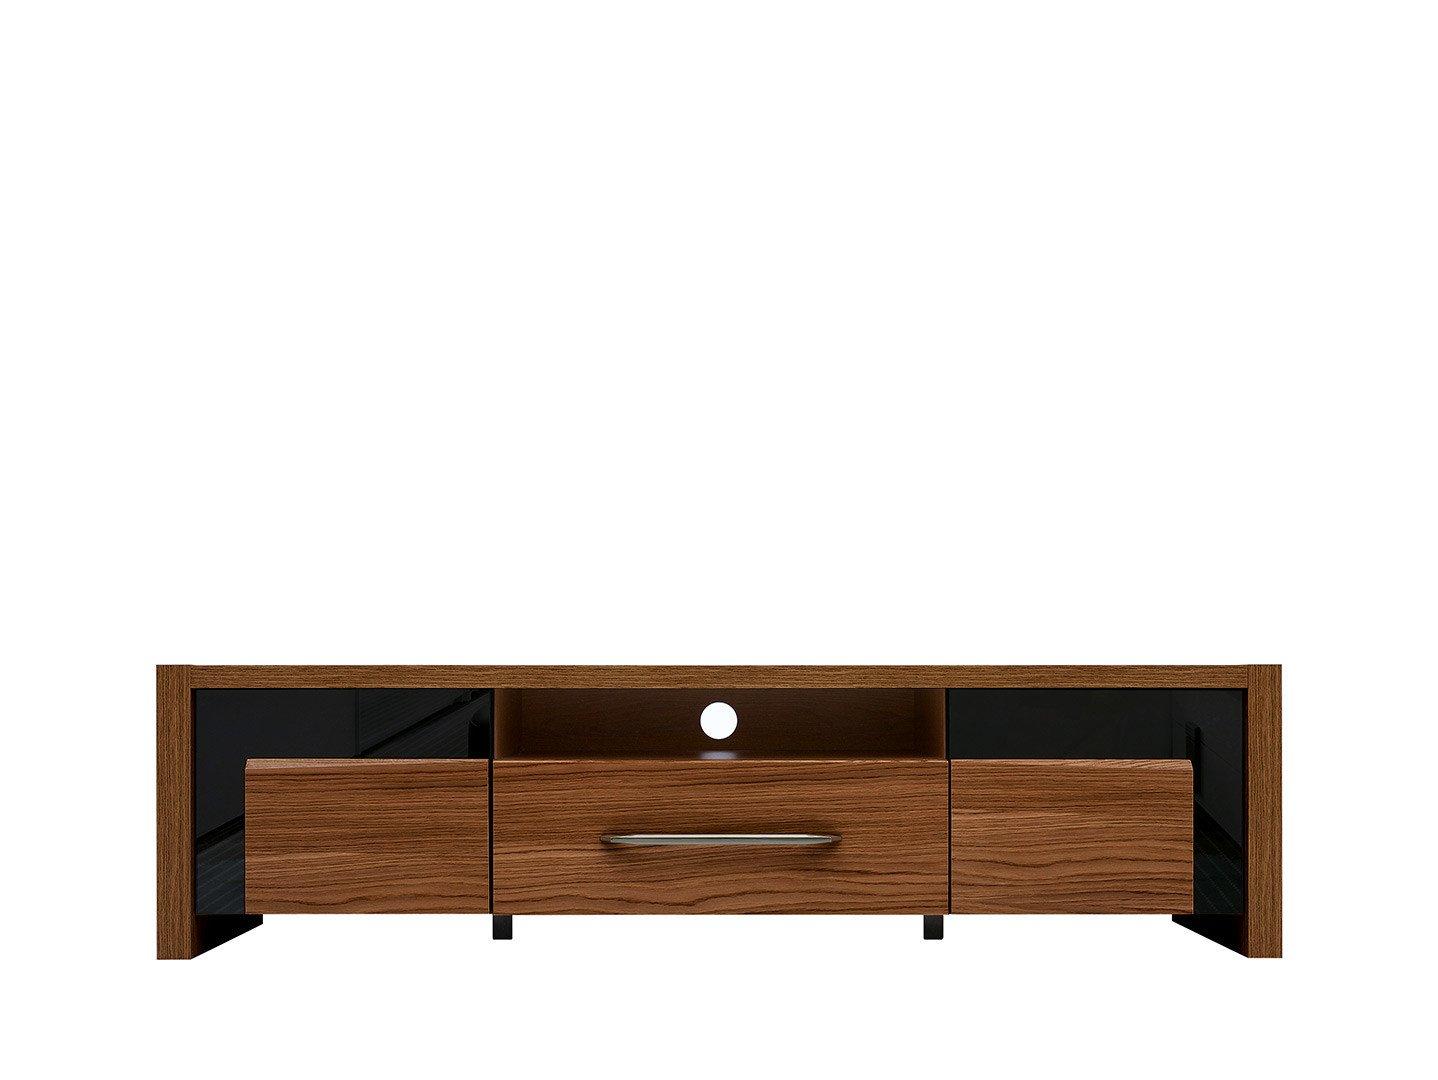 BRW TV stolík: AROSA - RTV2D1S Farba: dub hnedý / čierny lesk